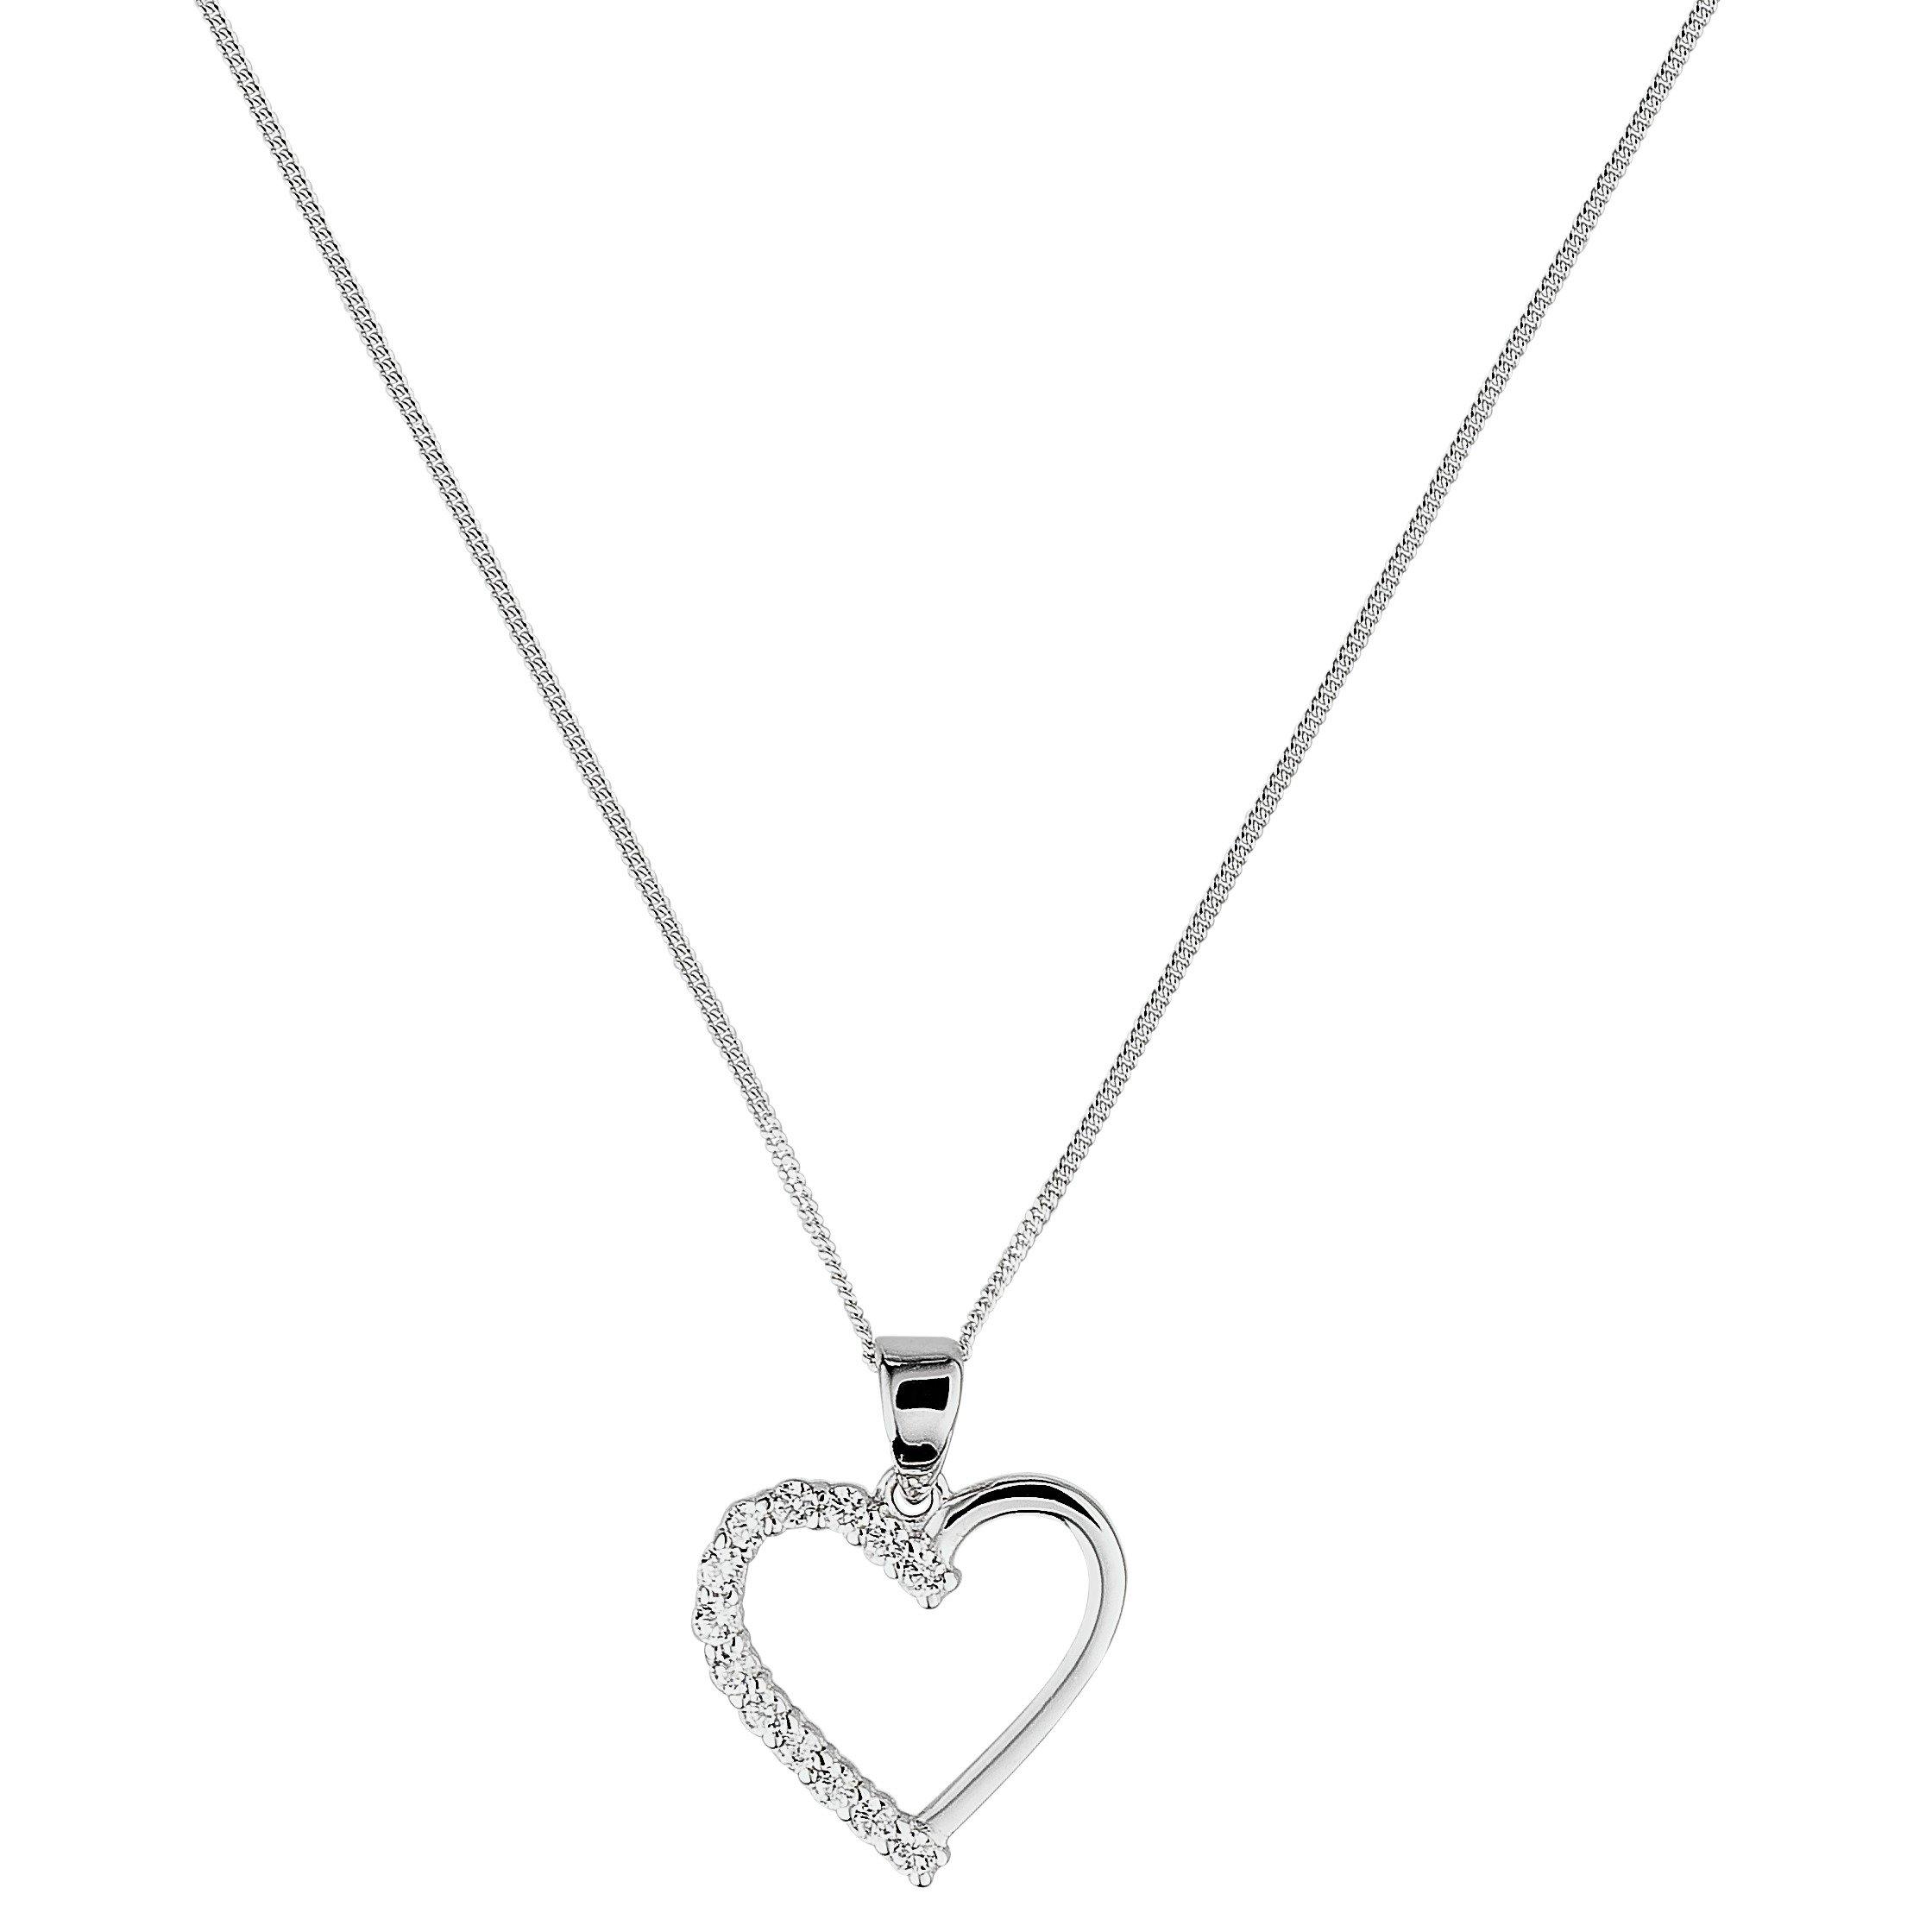 Revere 9ct White Gold Cubic Zirconia Heart Pendant